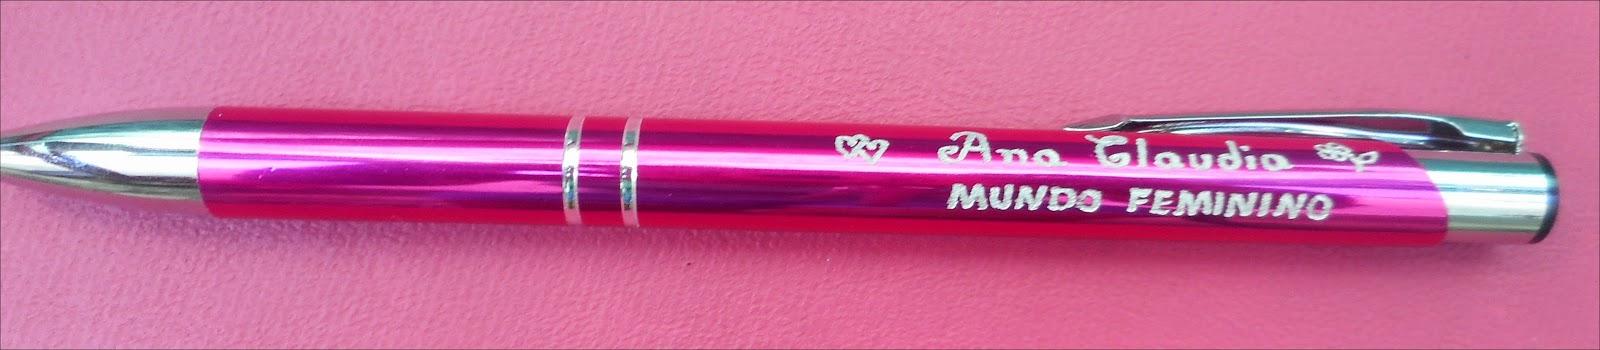 caneta super fofa,caneta linda